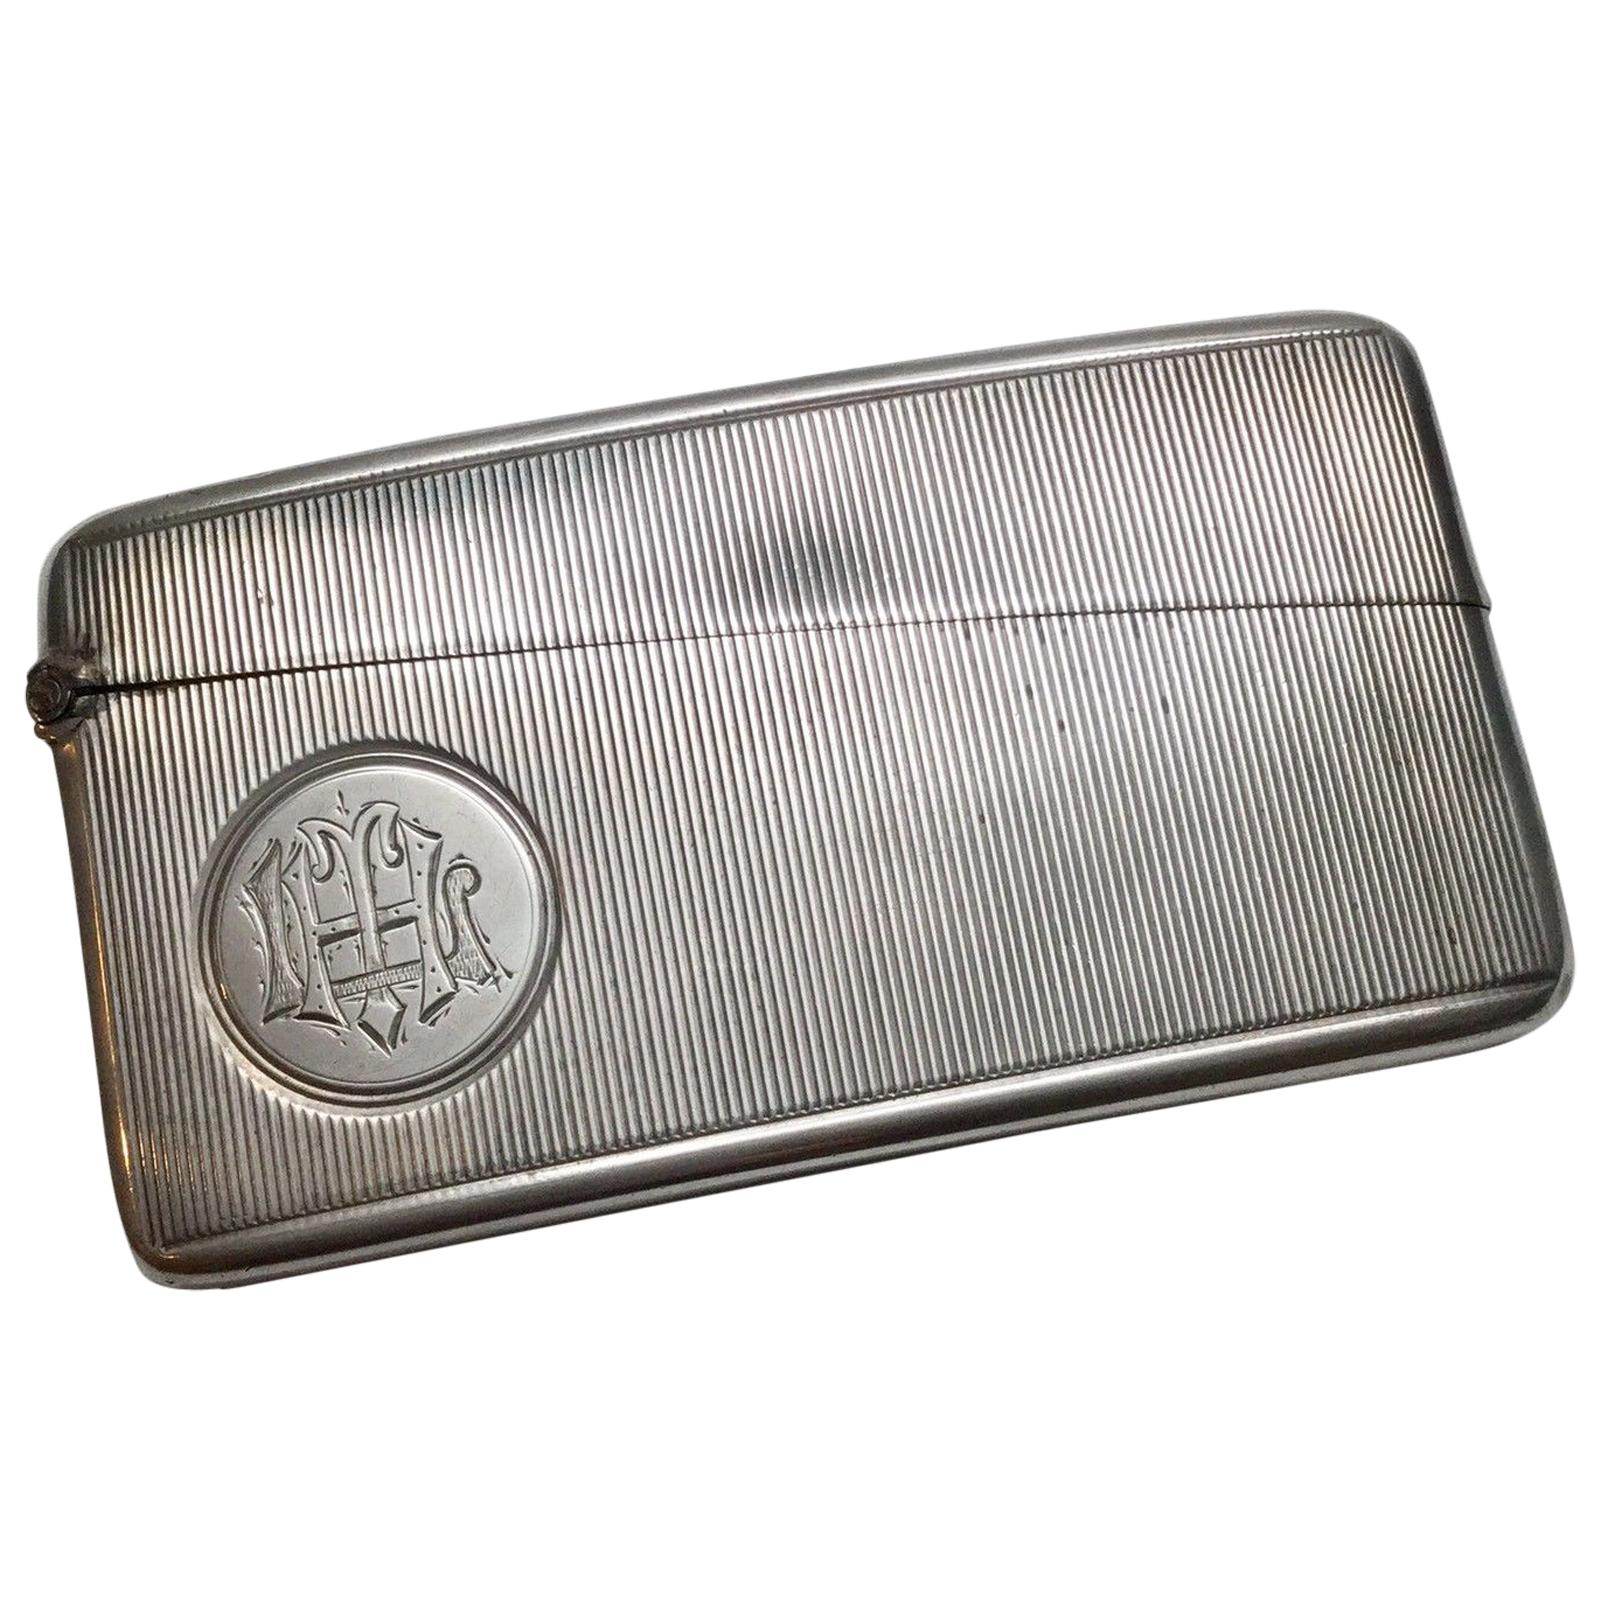 Antique Horton & Allday Birmingham England Sterling Silver Curved Card Case